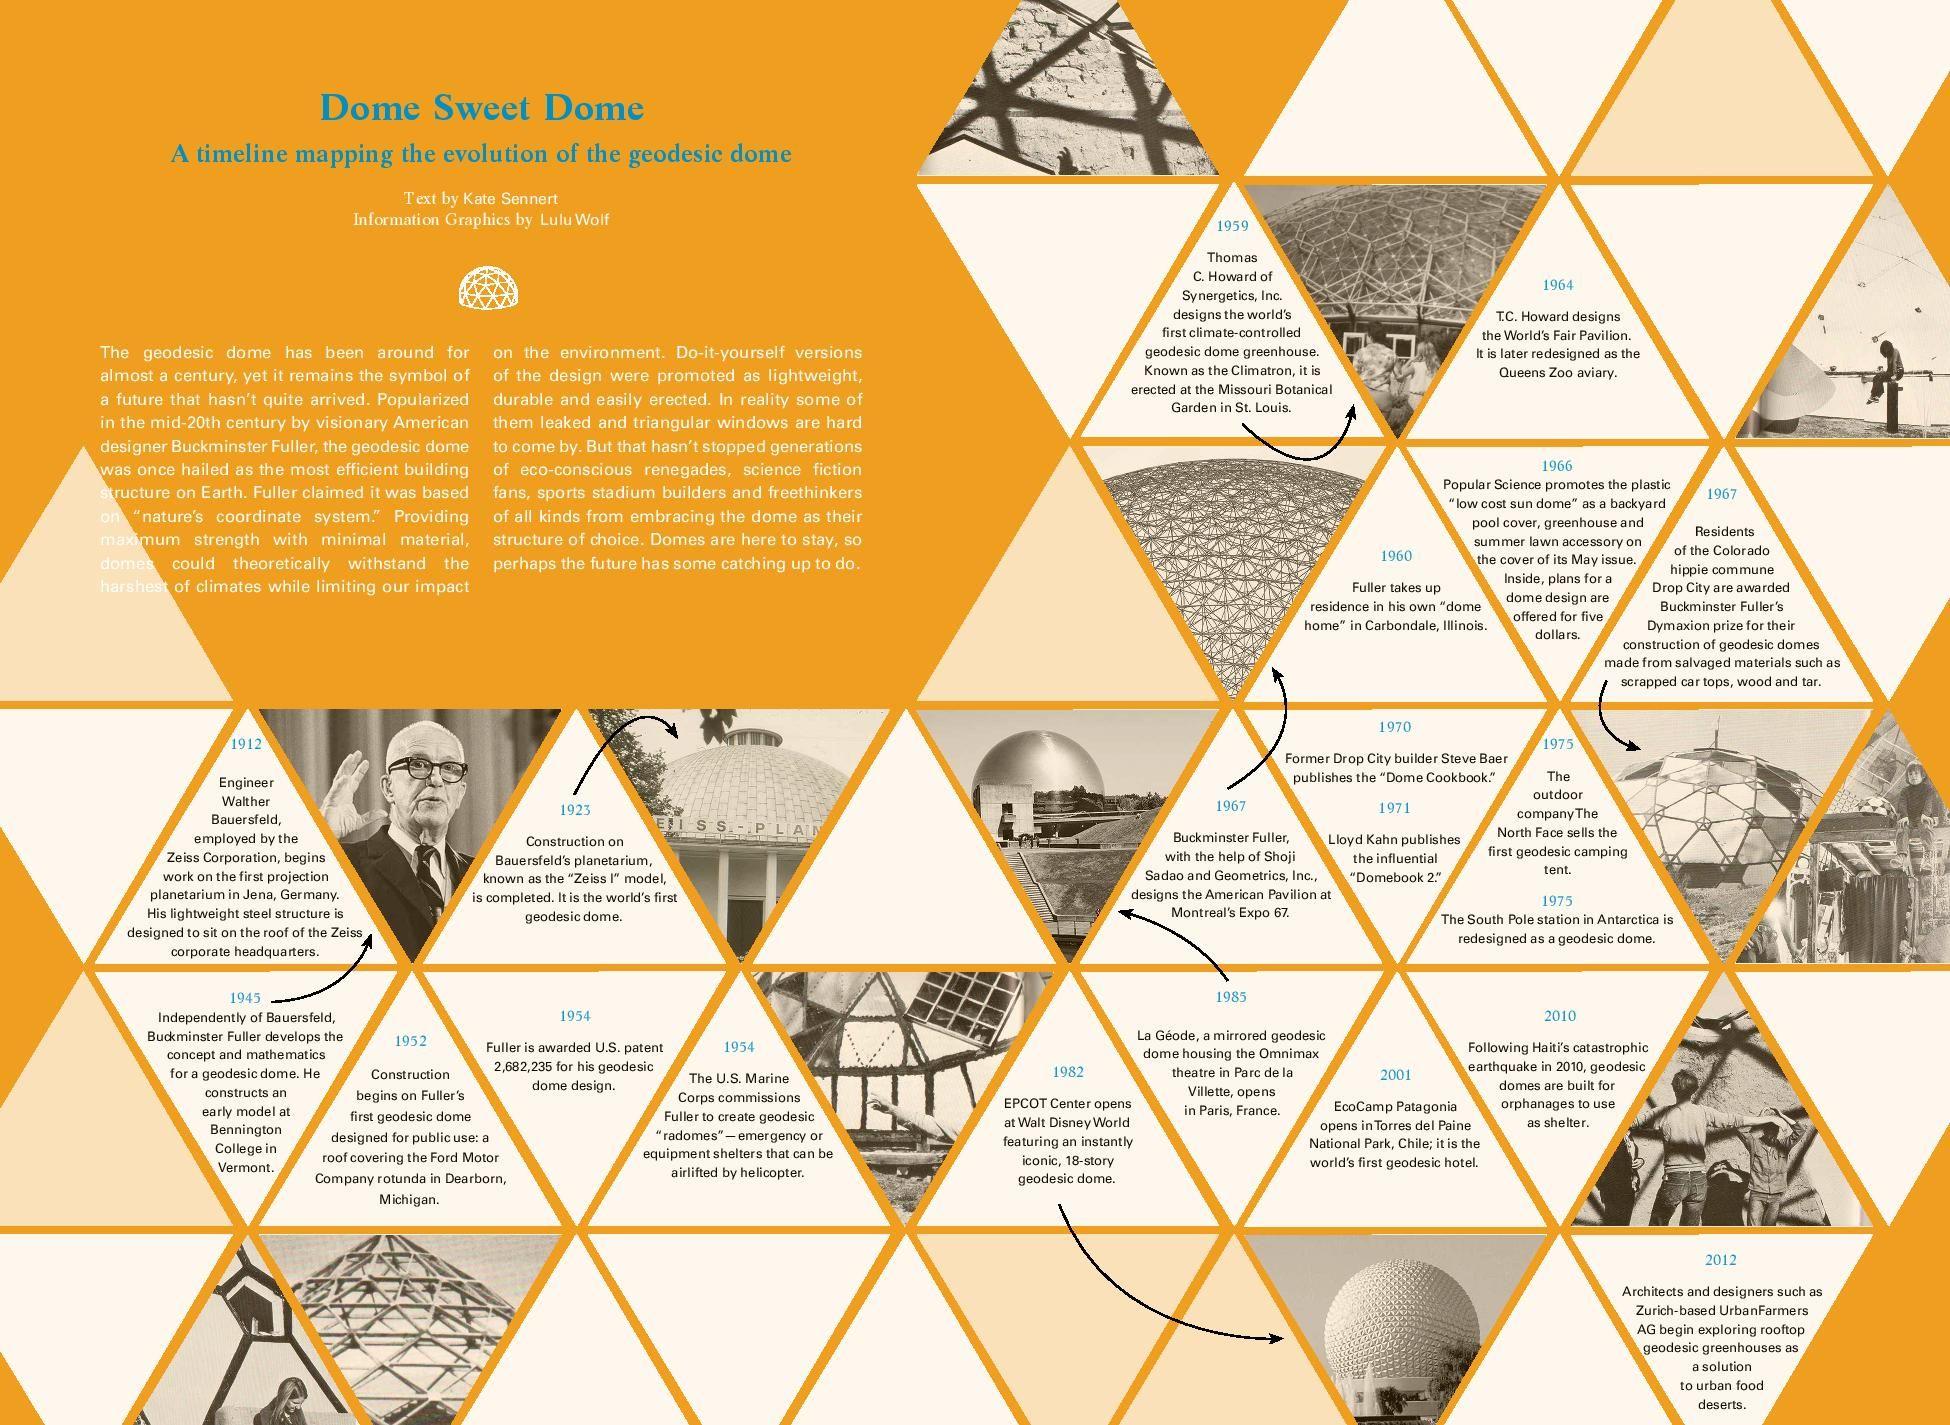 Paris 2 futurismen fyller hundra ar 2